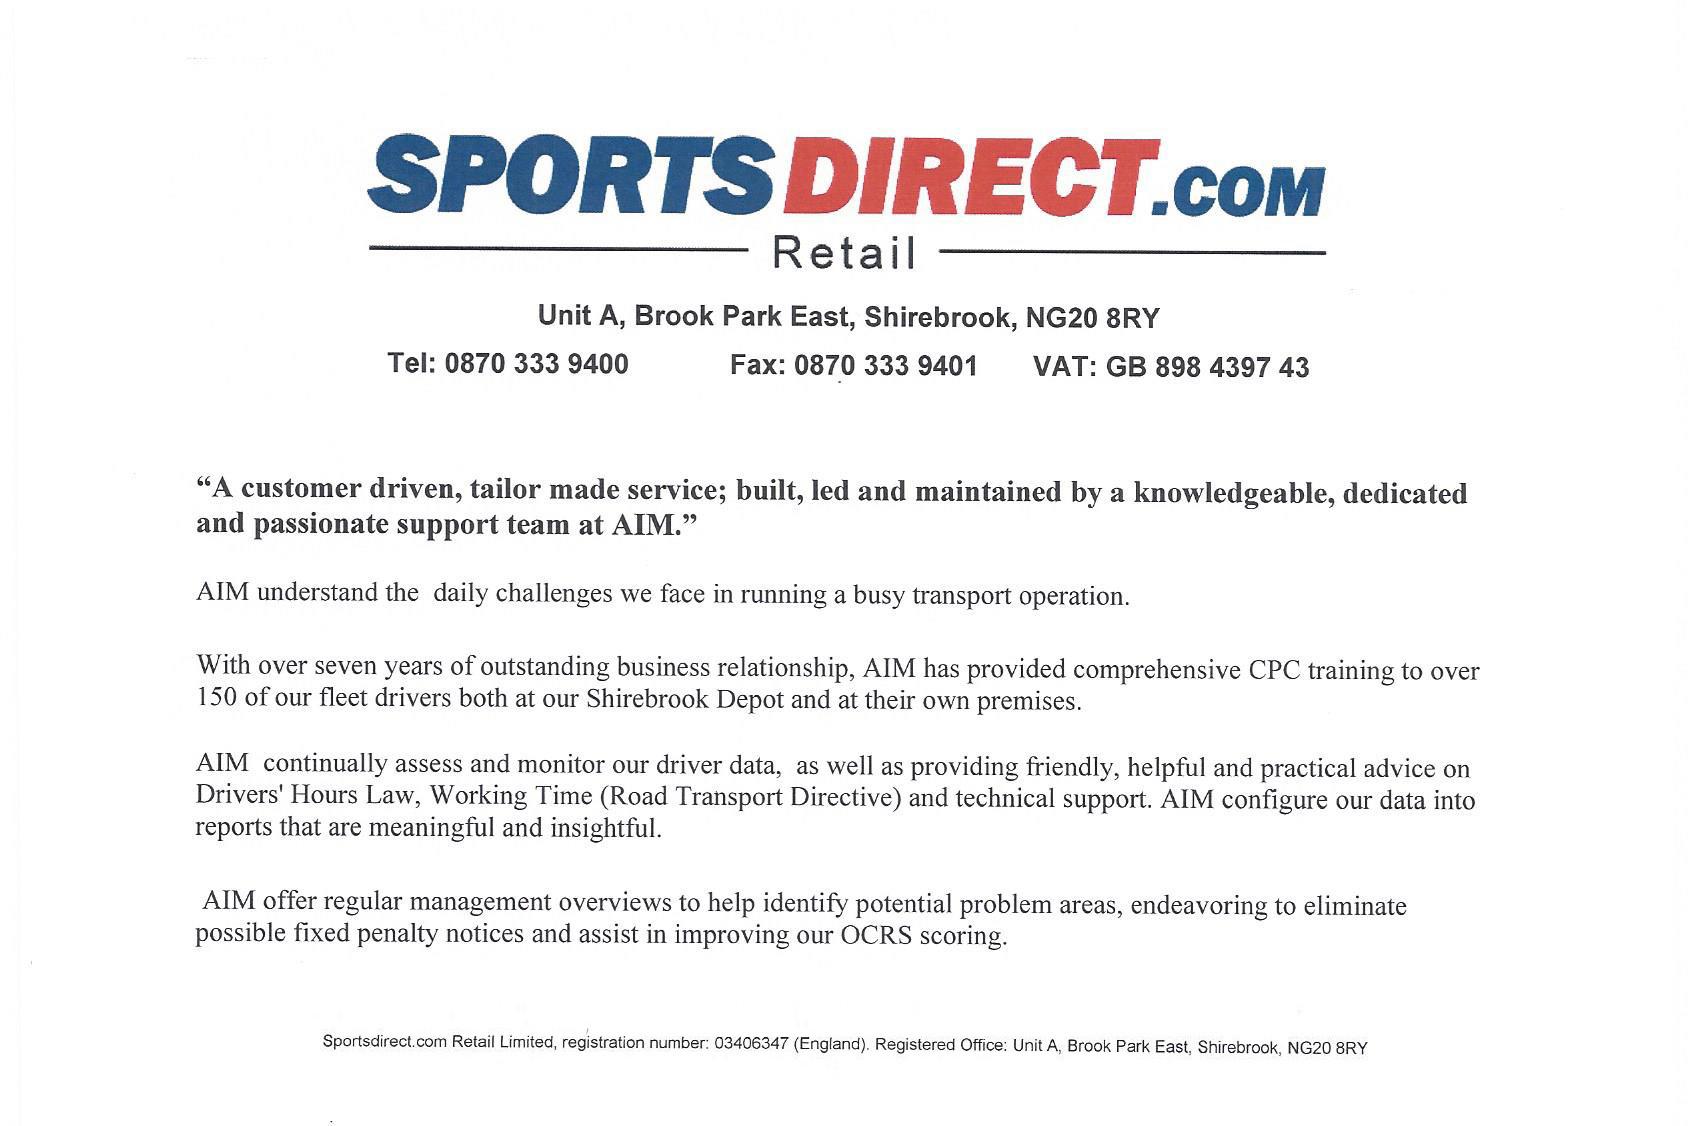 Sports Direct Testimonial